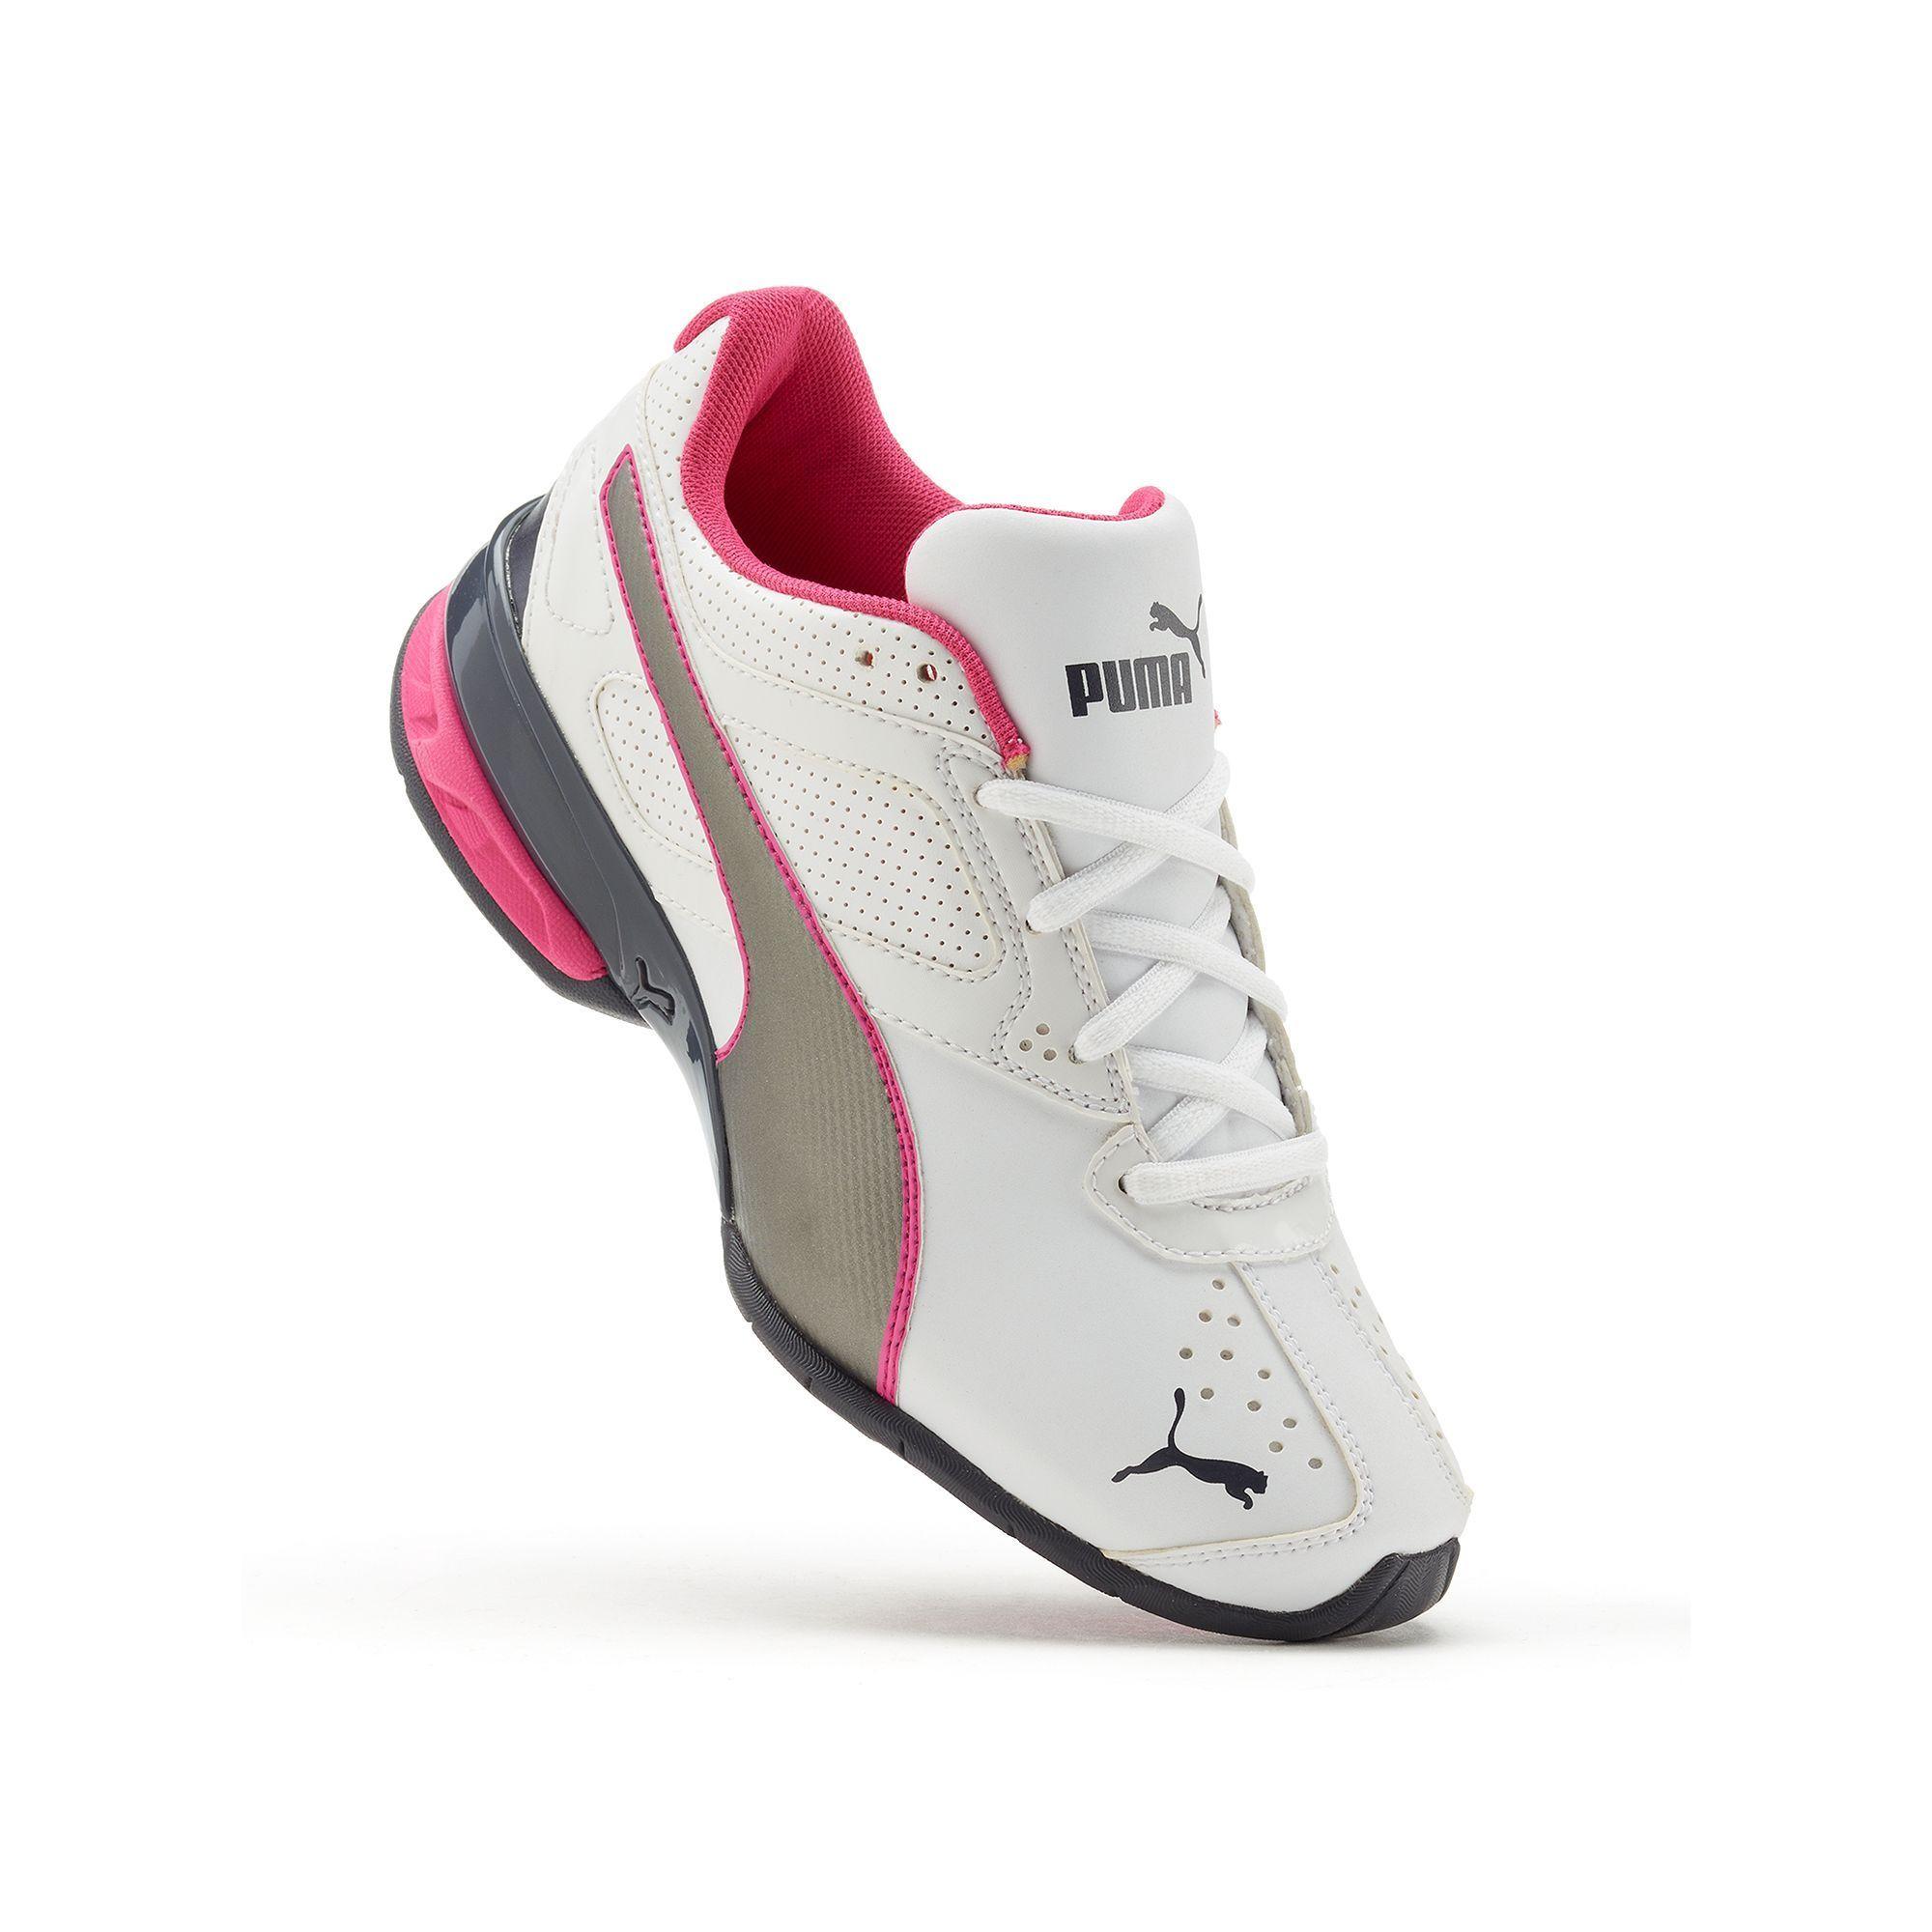 Tazon Shoes And Running Jr Pumas Girls' Puma Sl 6 Shoes UgnYU1a